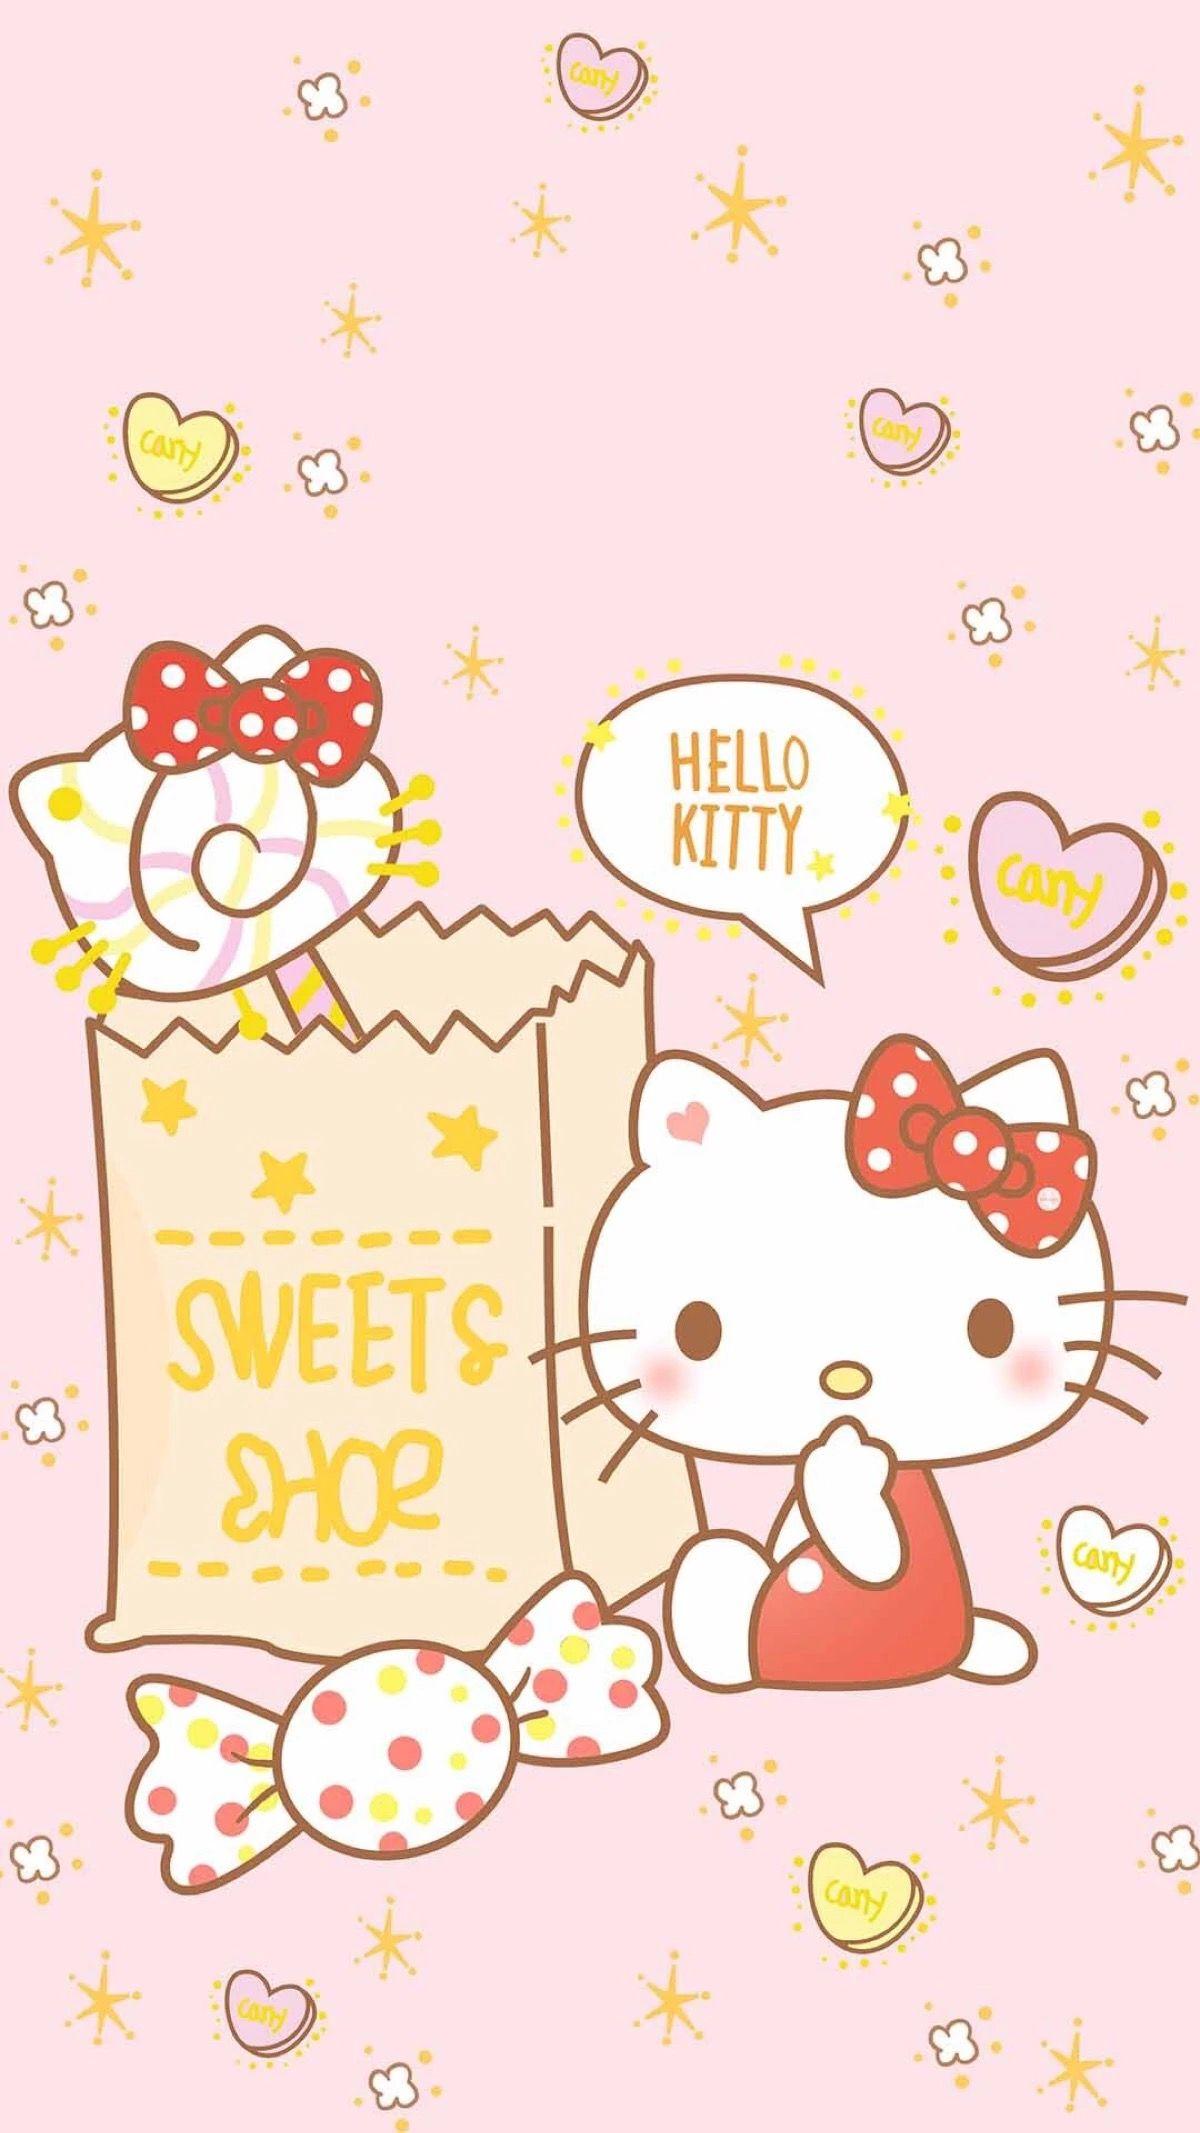 Hello kitty sanrio pinterest hello kitty kitty and sanrio